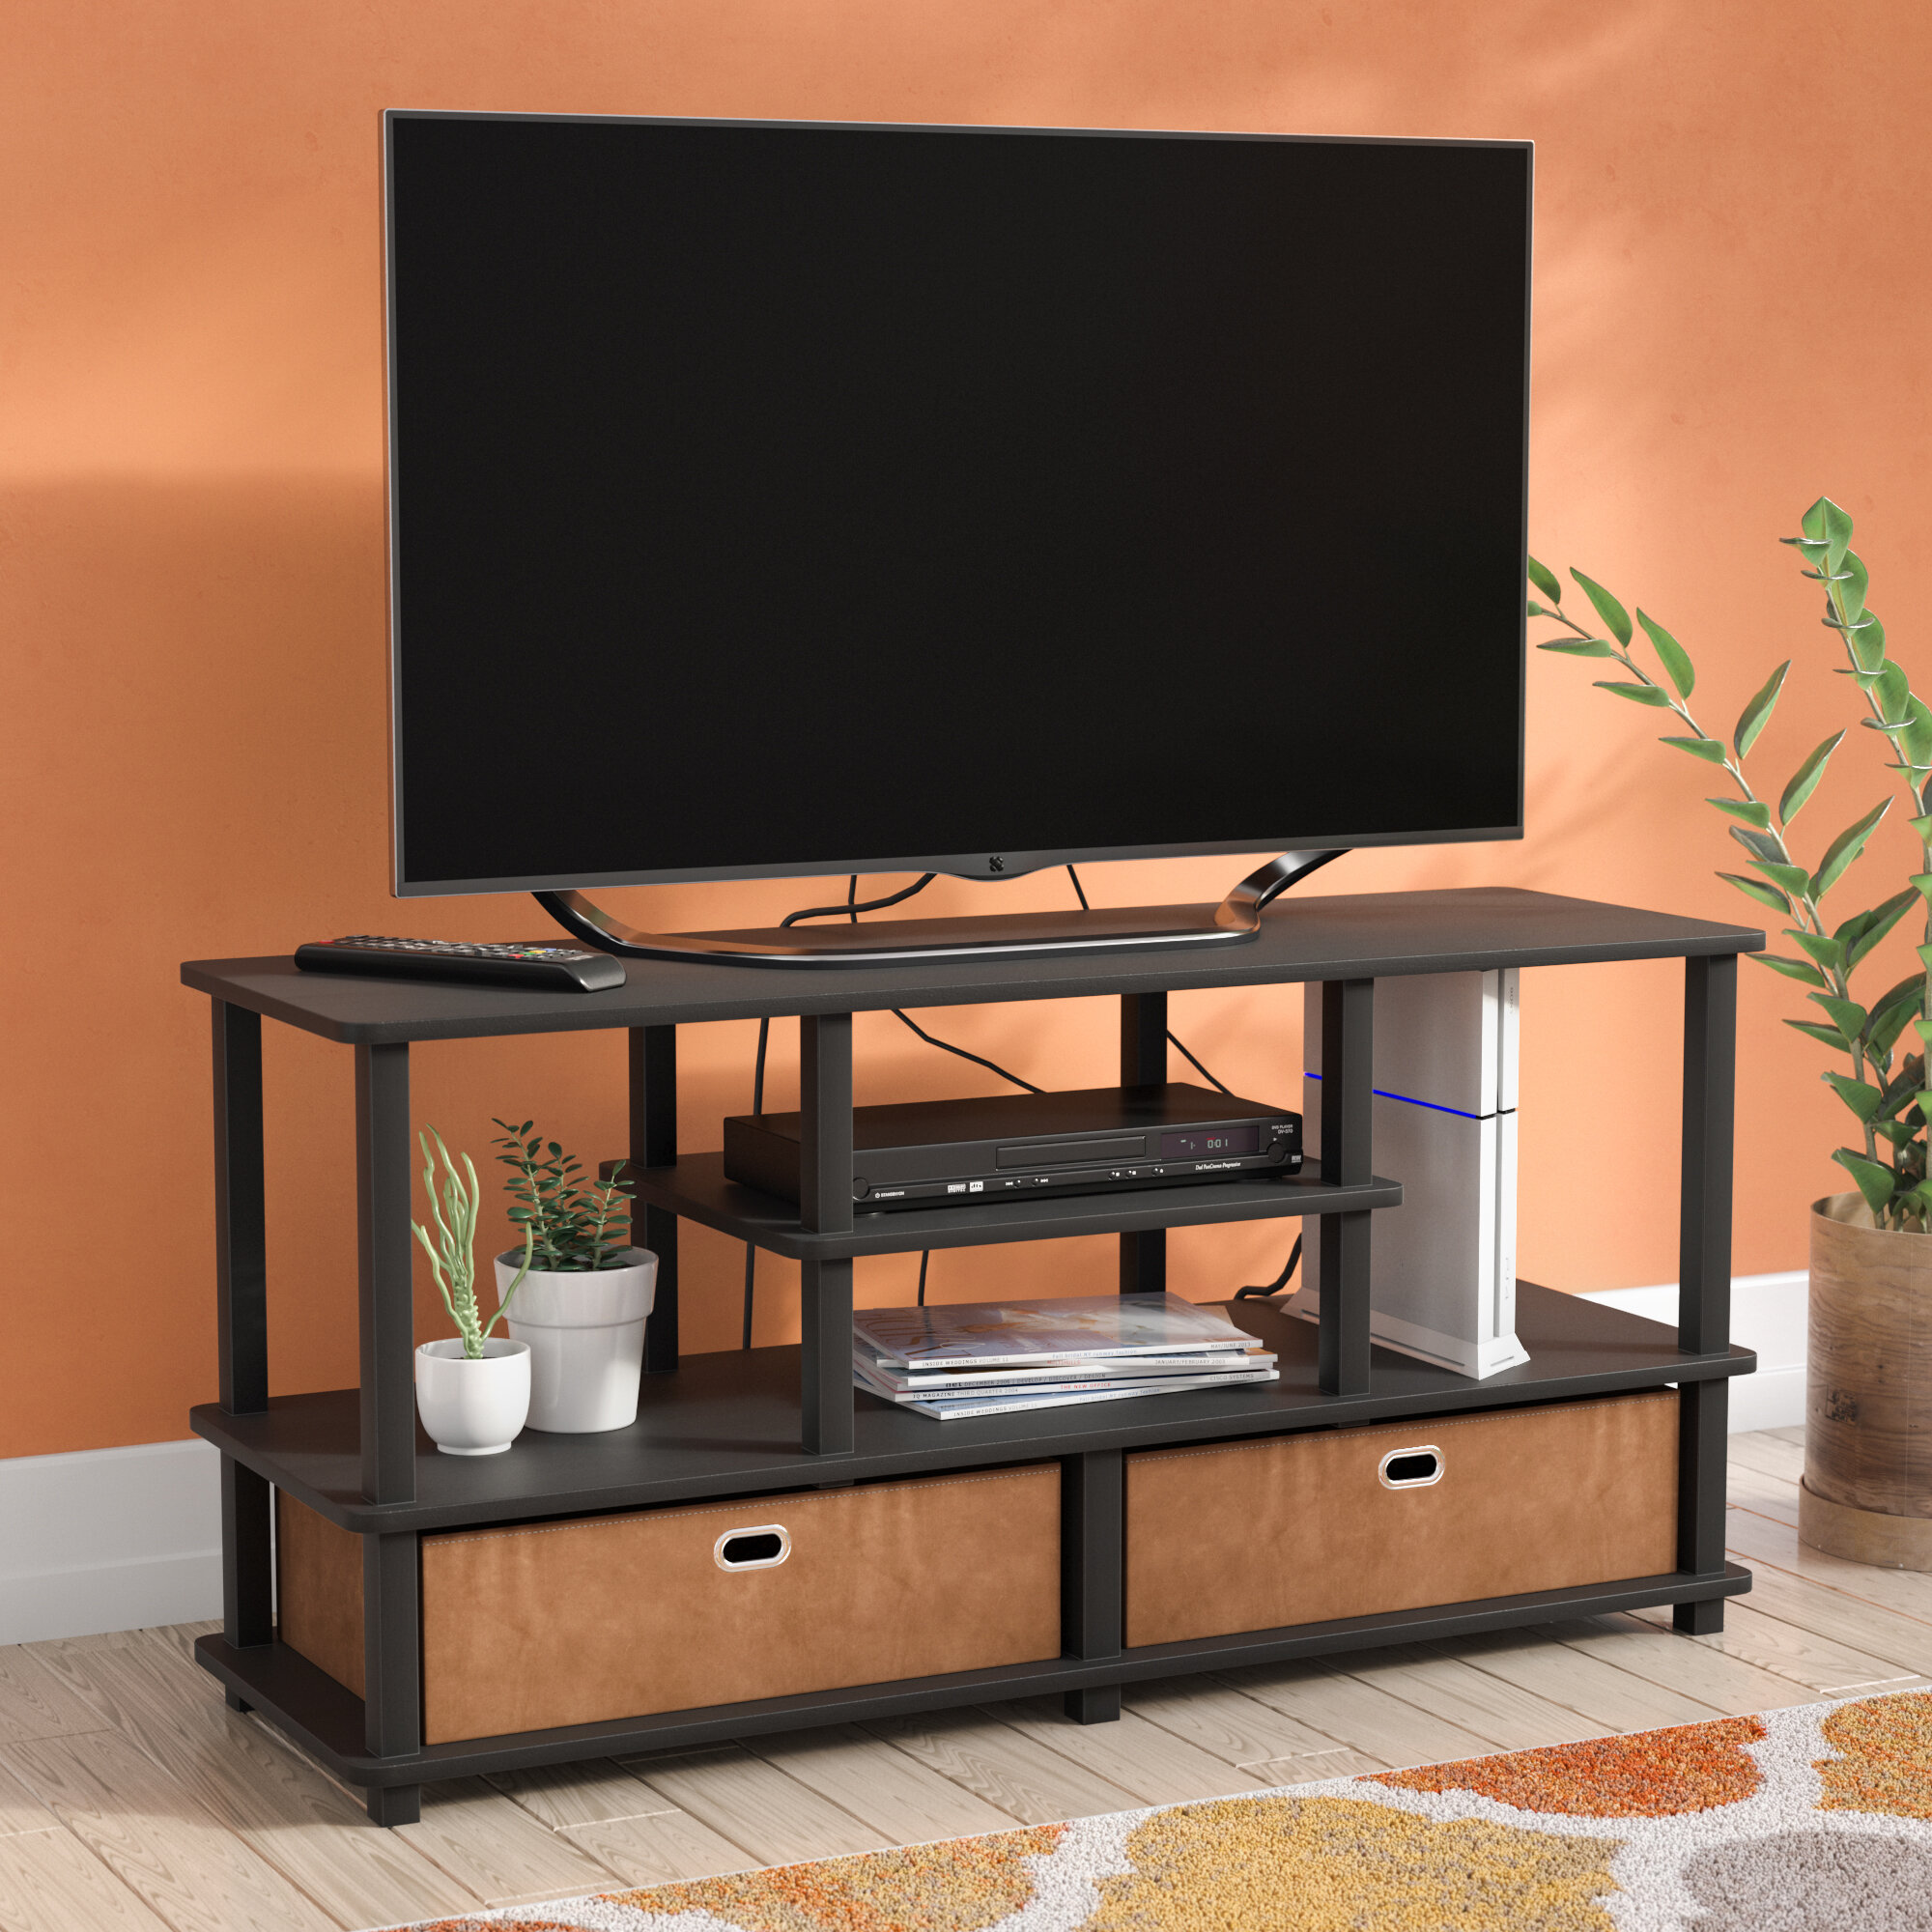 Amani 119cm Tv Stand